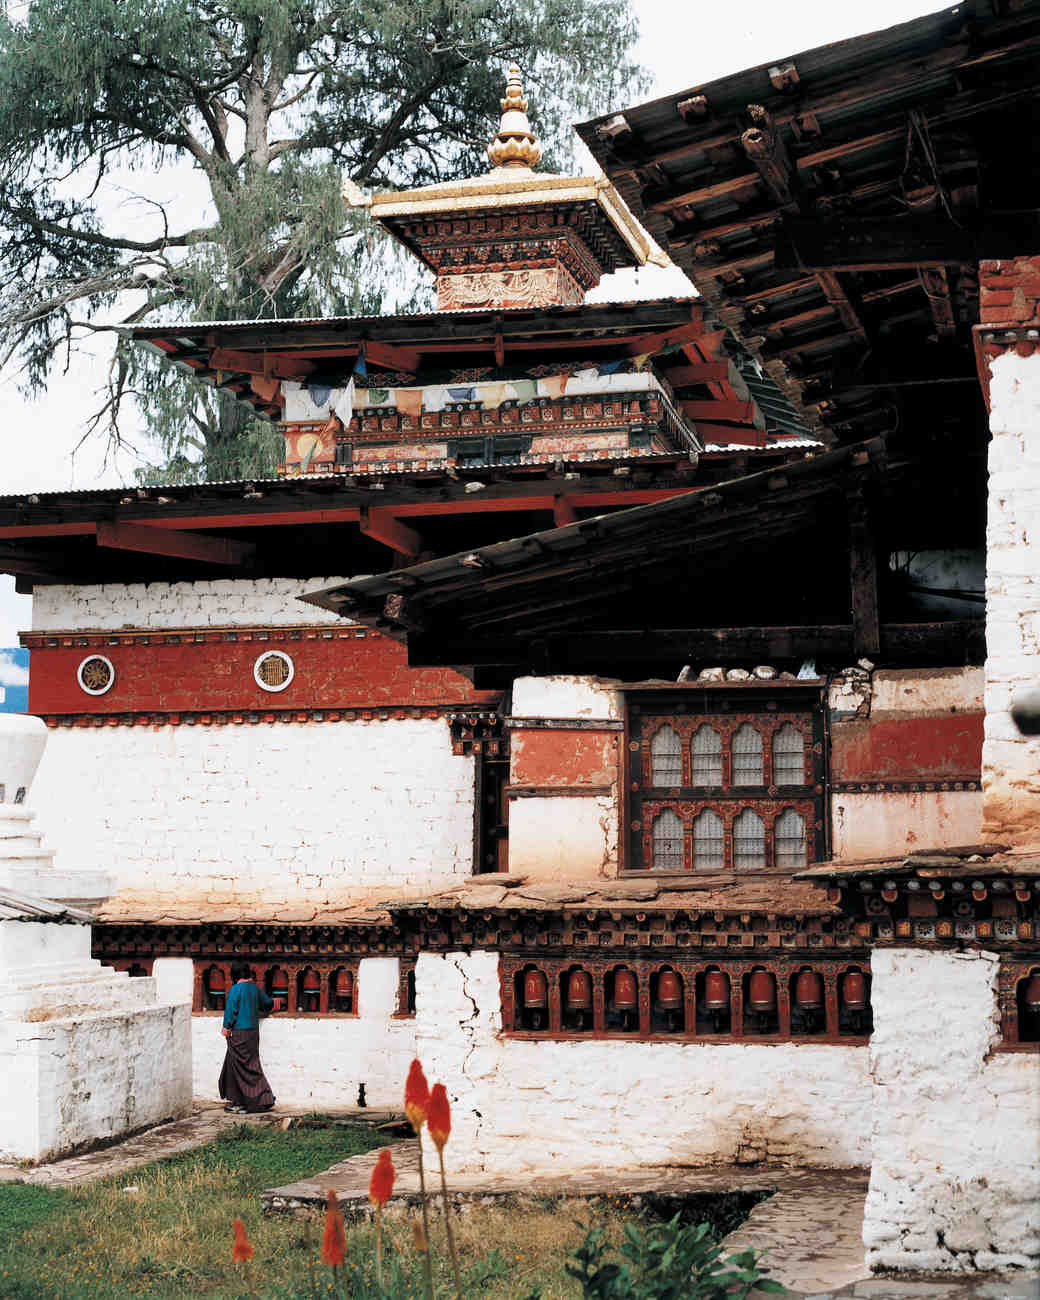 adventurous-ways-to-marry-uma-ubud-kyichu-temple-1215.jpg